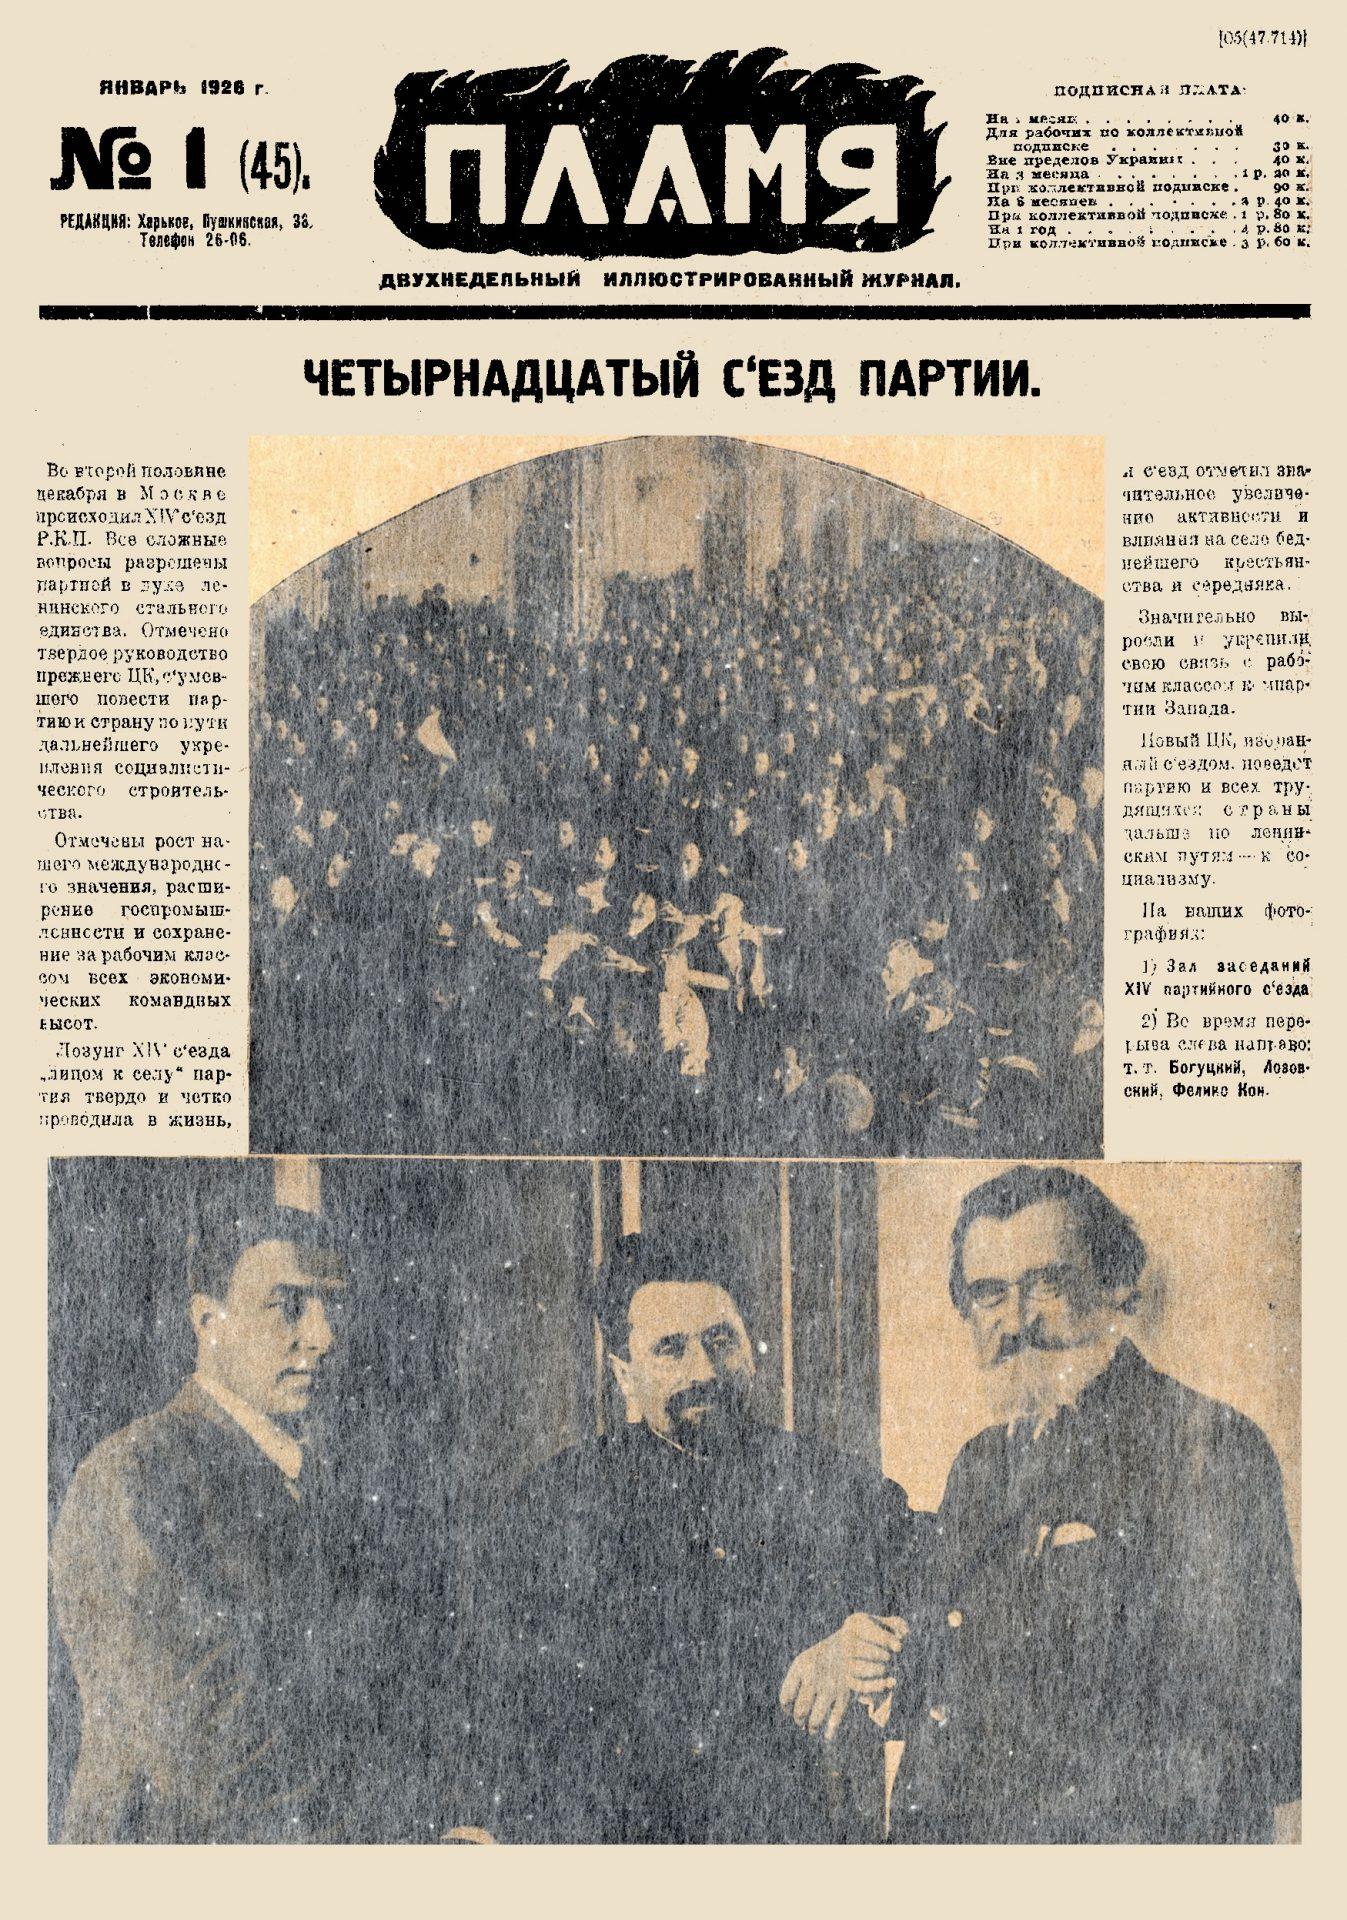 Пламя_1926_№1